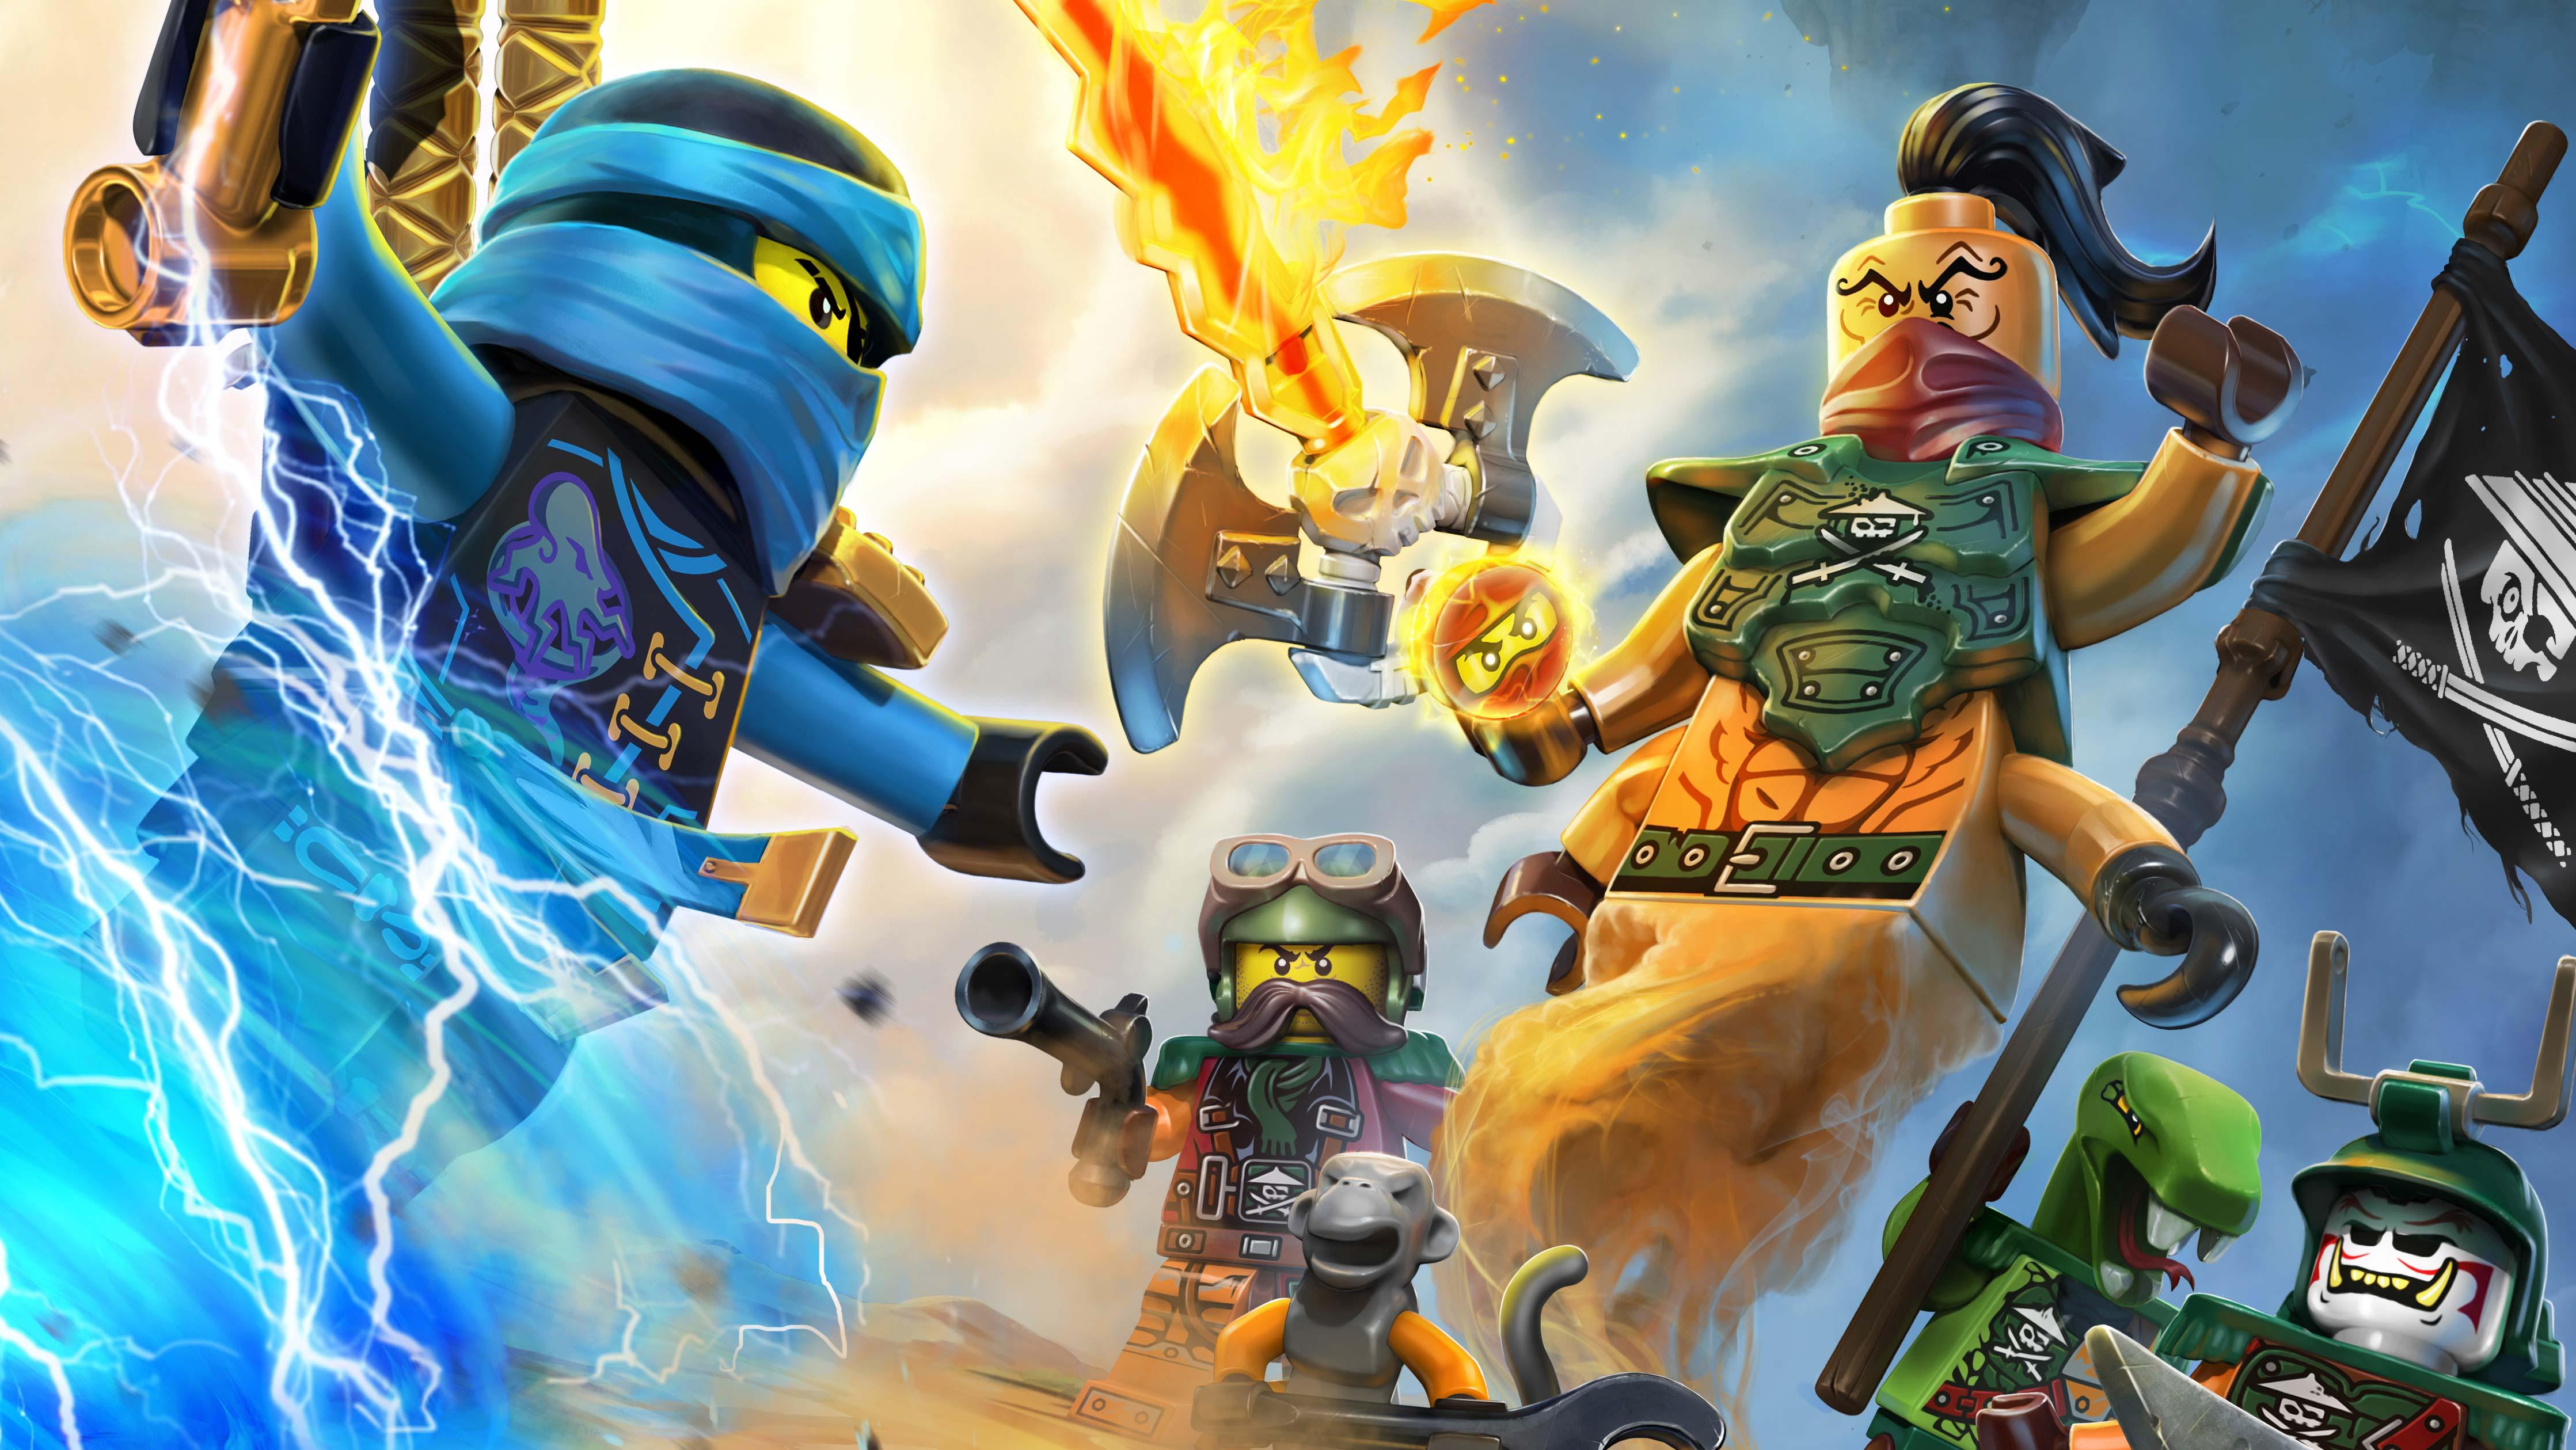 Coloriage ninjago et dessin gratuit imprimer - Jeux de ninjago gratuit lego ...